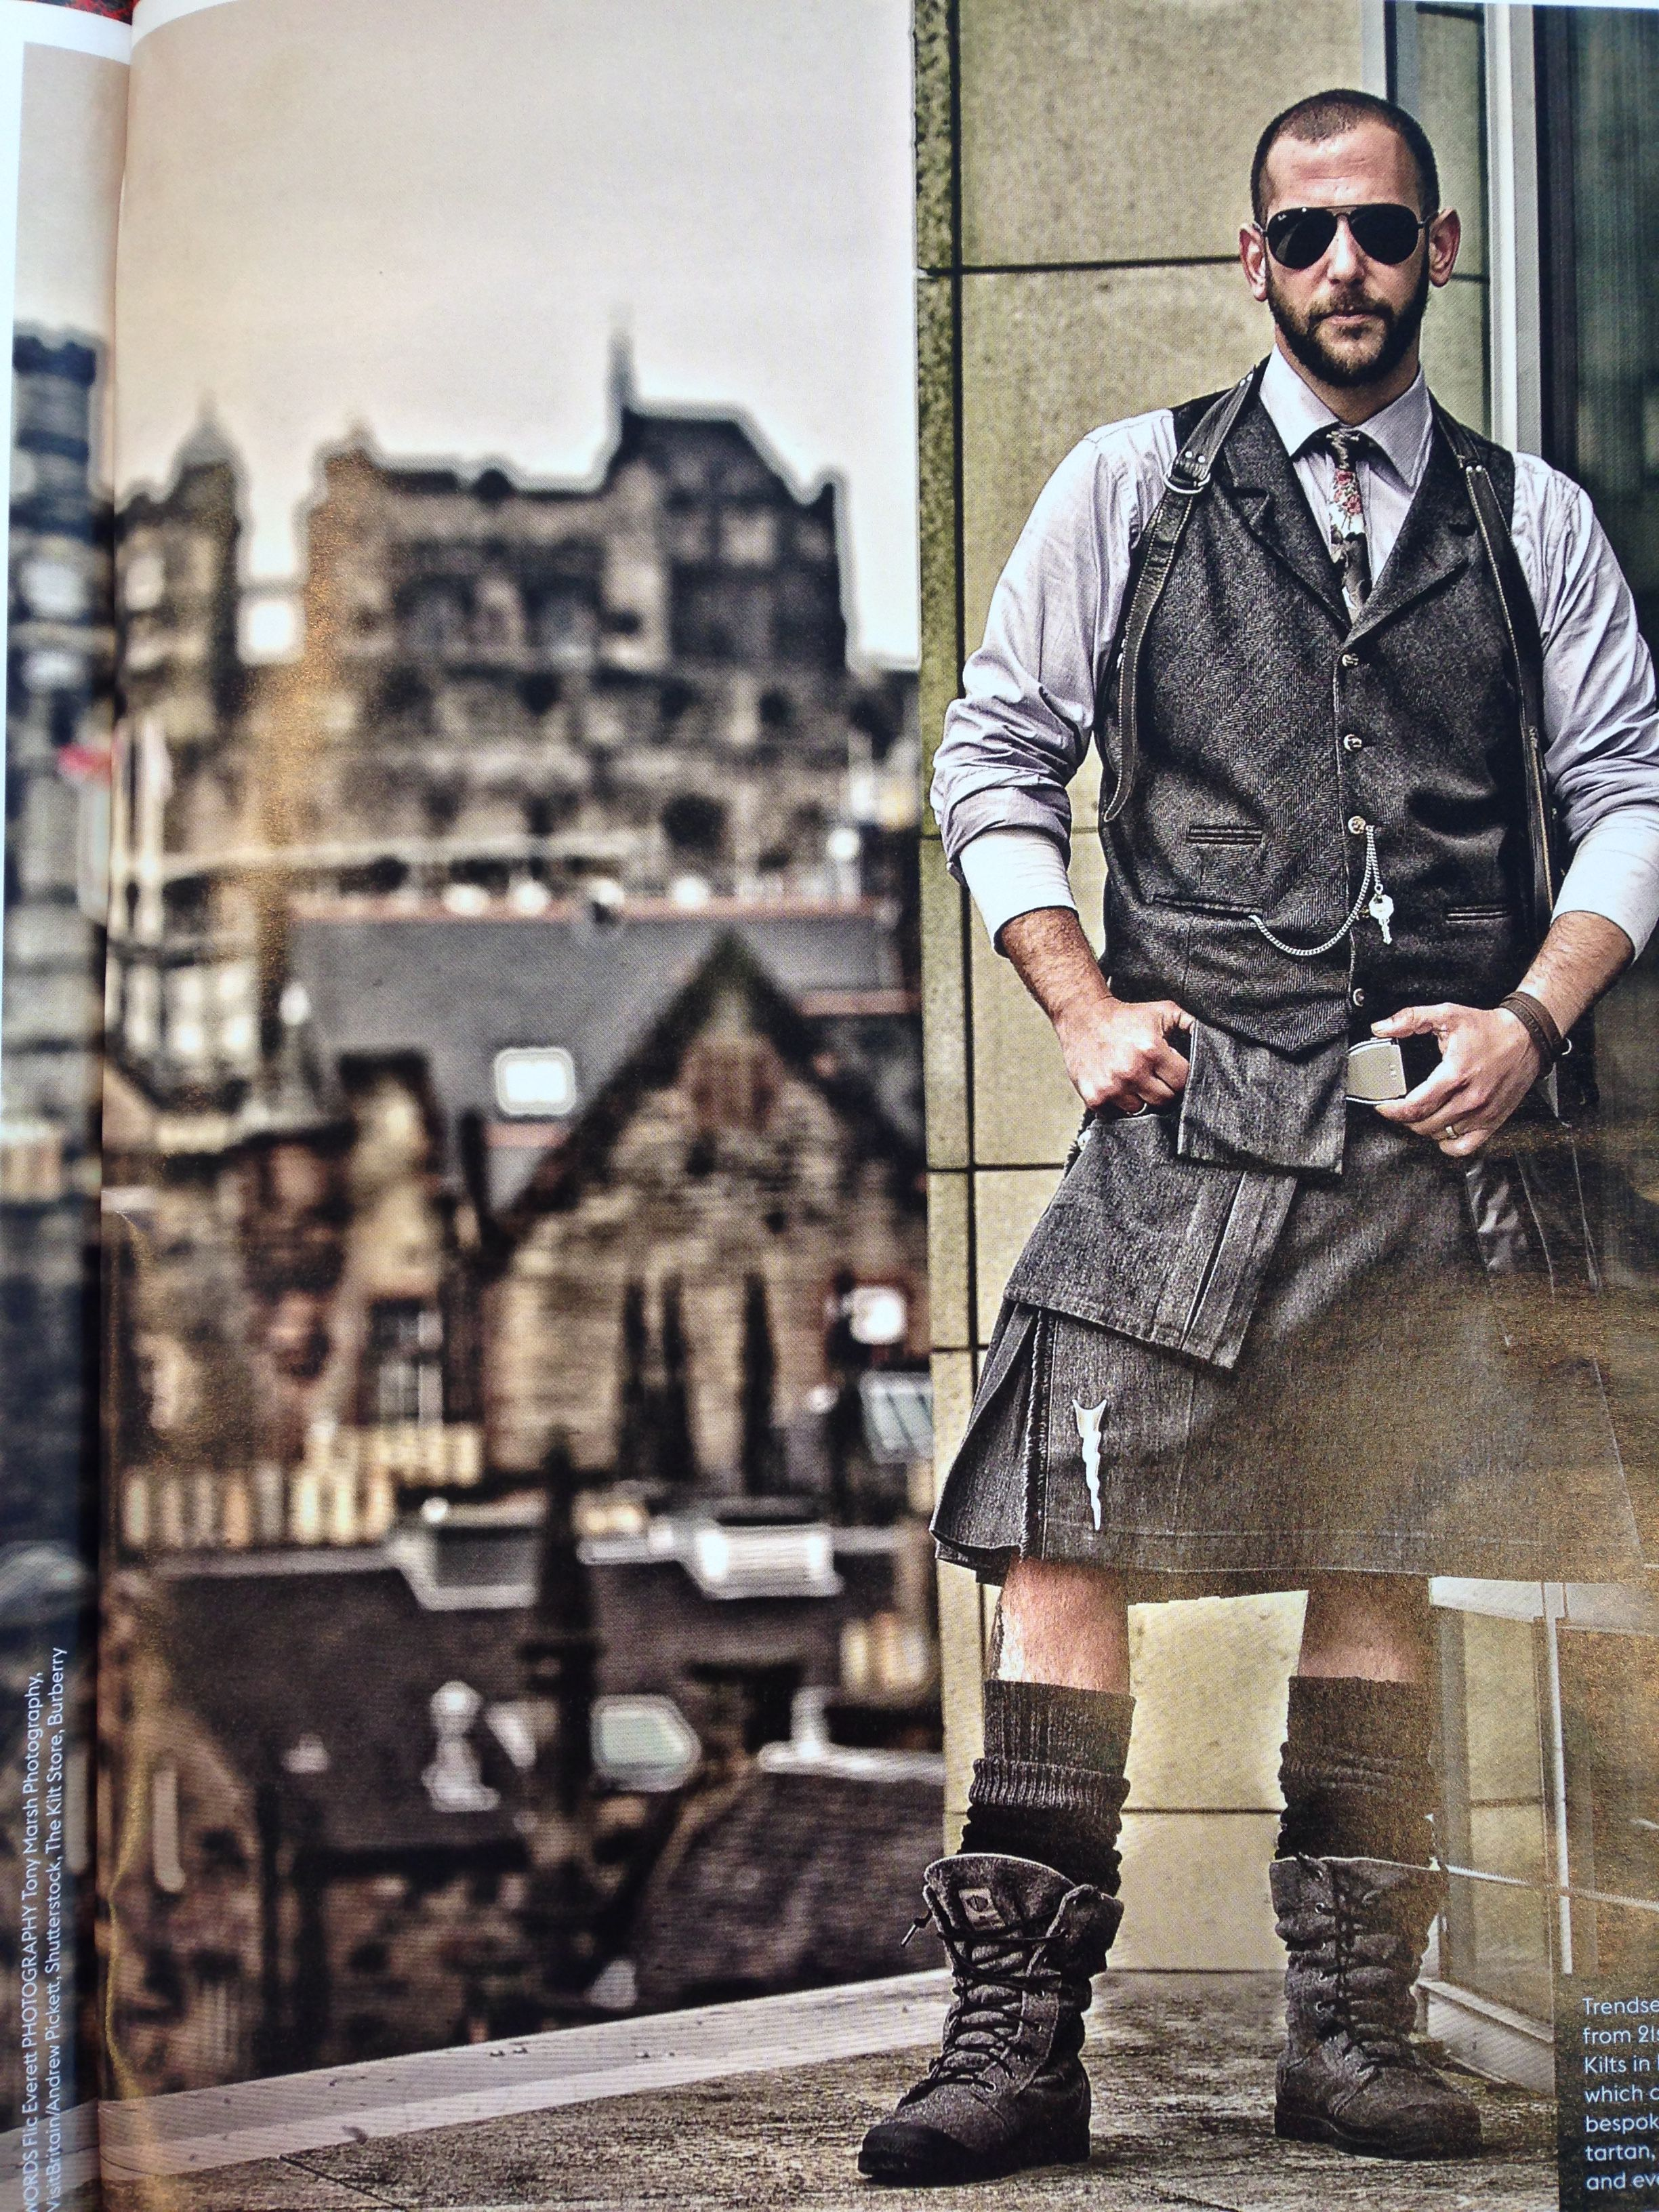 21st Century Kilts Kilt Outfits Men In Kilts Modern Kilts